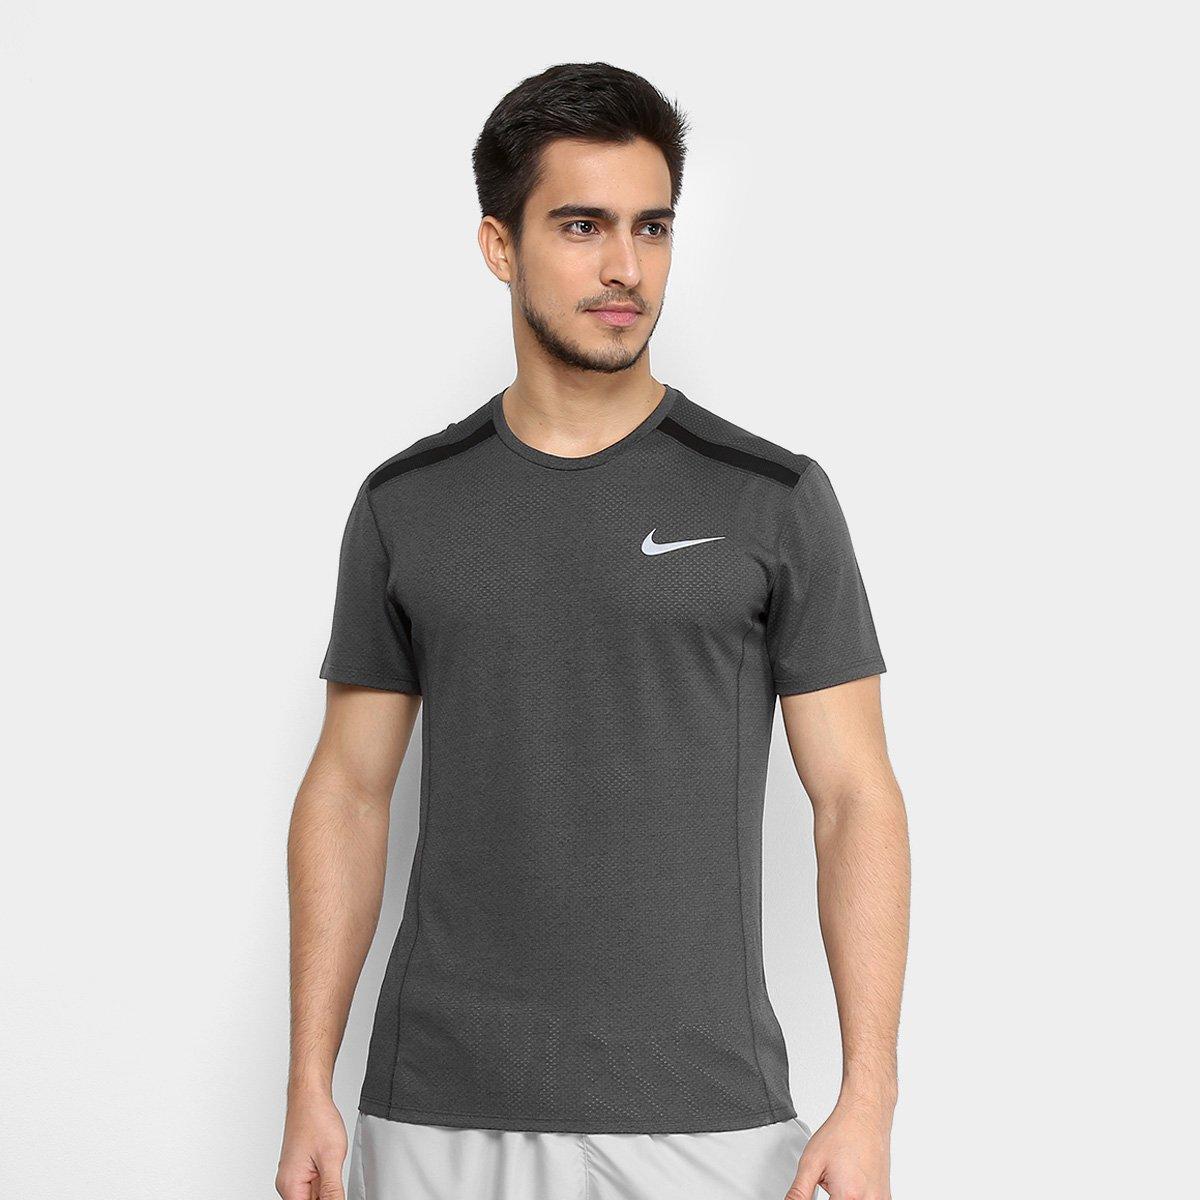 e19fcd3edd273 Camiseta Nike Dry Cool Miler SS Masculina - Cinza e Preto - Compre Agora